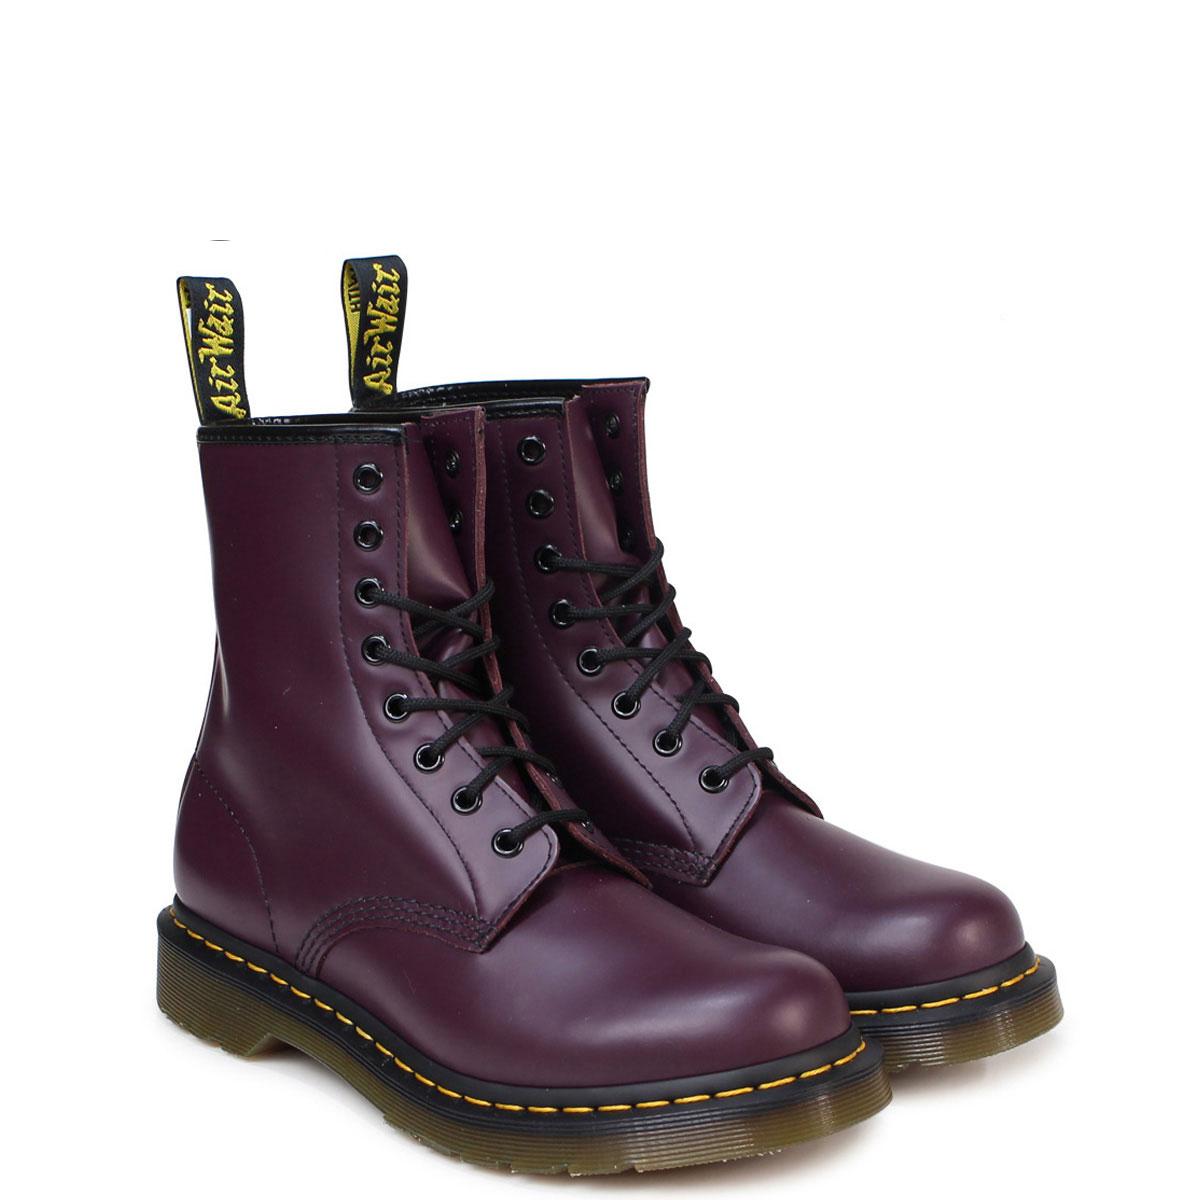 76088b44e785e Dr.Martens Dr. Martens 1460 8 hole boots Womens R11821500 WOMENS 8EYE BOOT  mens